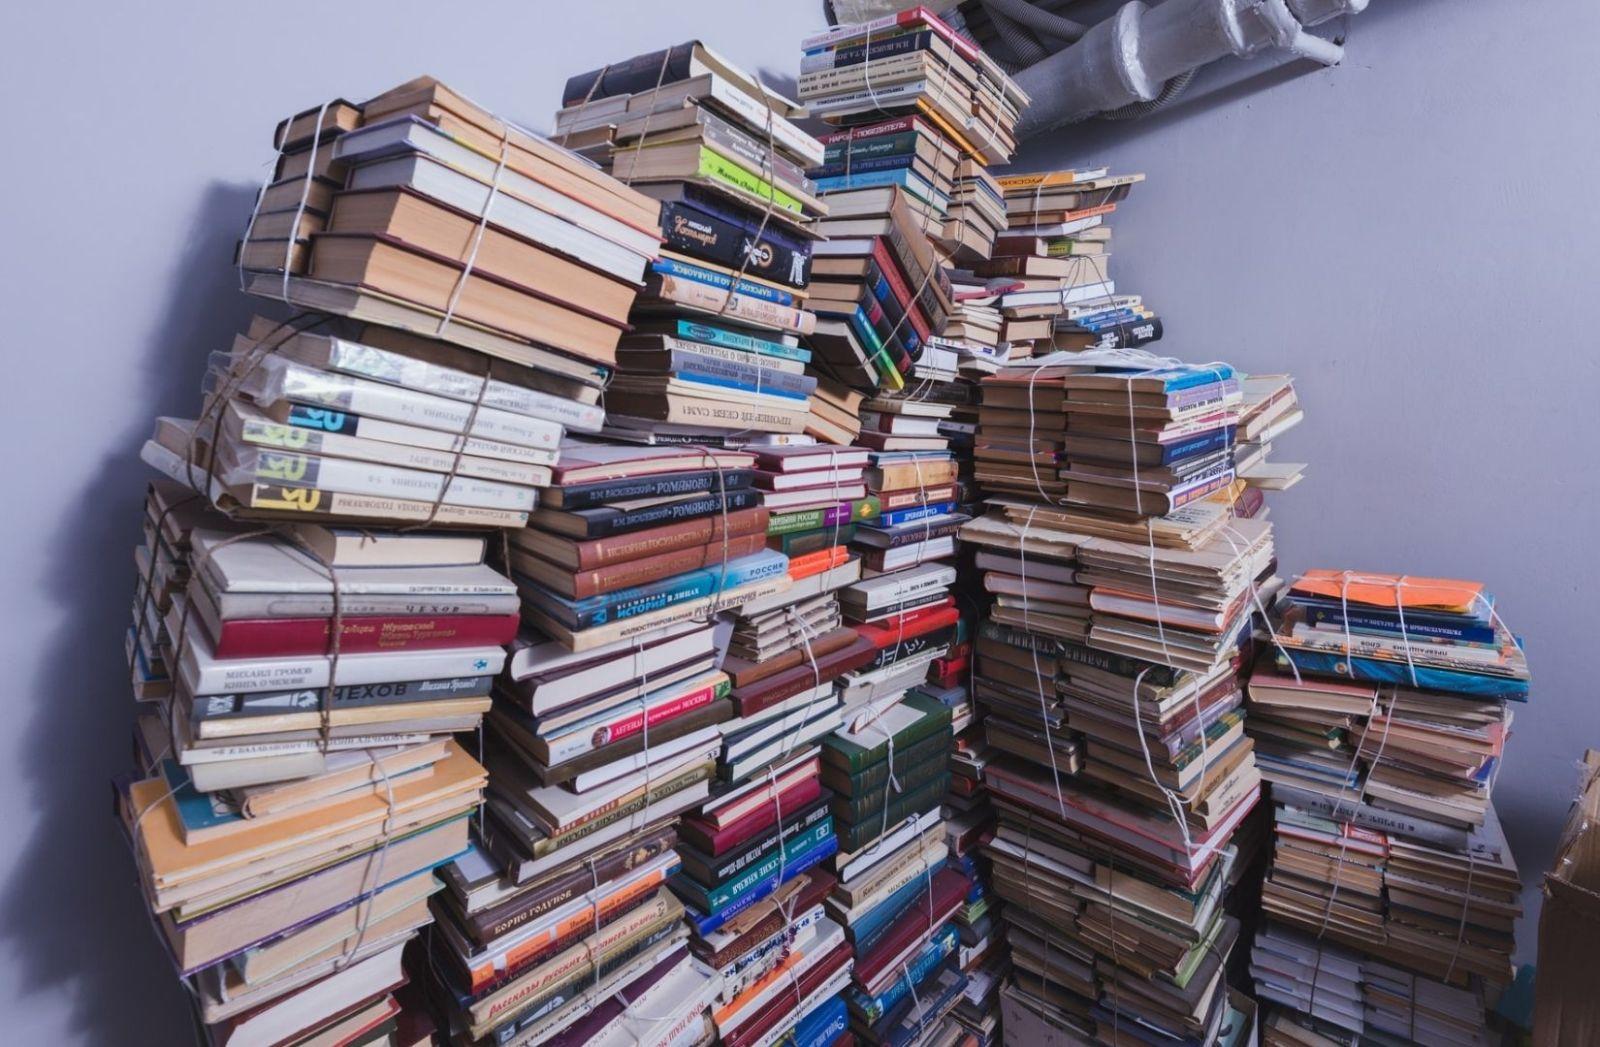 Bücher in einem Keller. (Foto: Artem Maltsev, Unsplash.com)